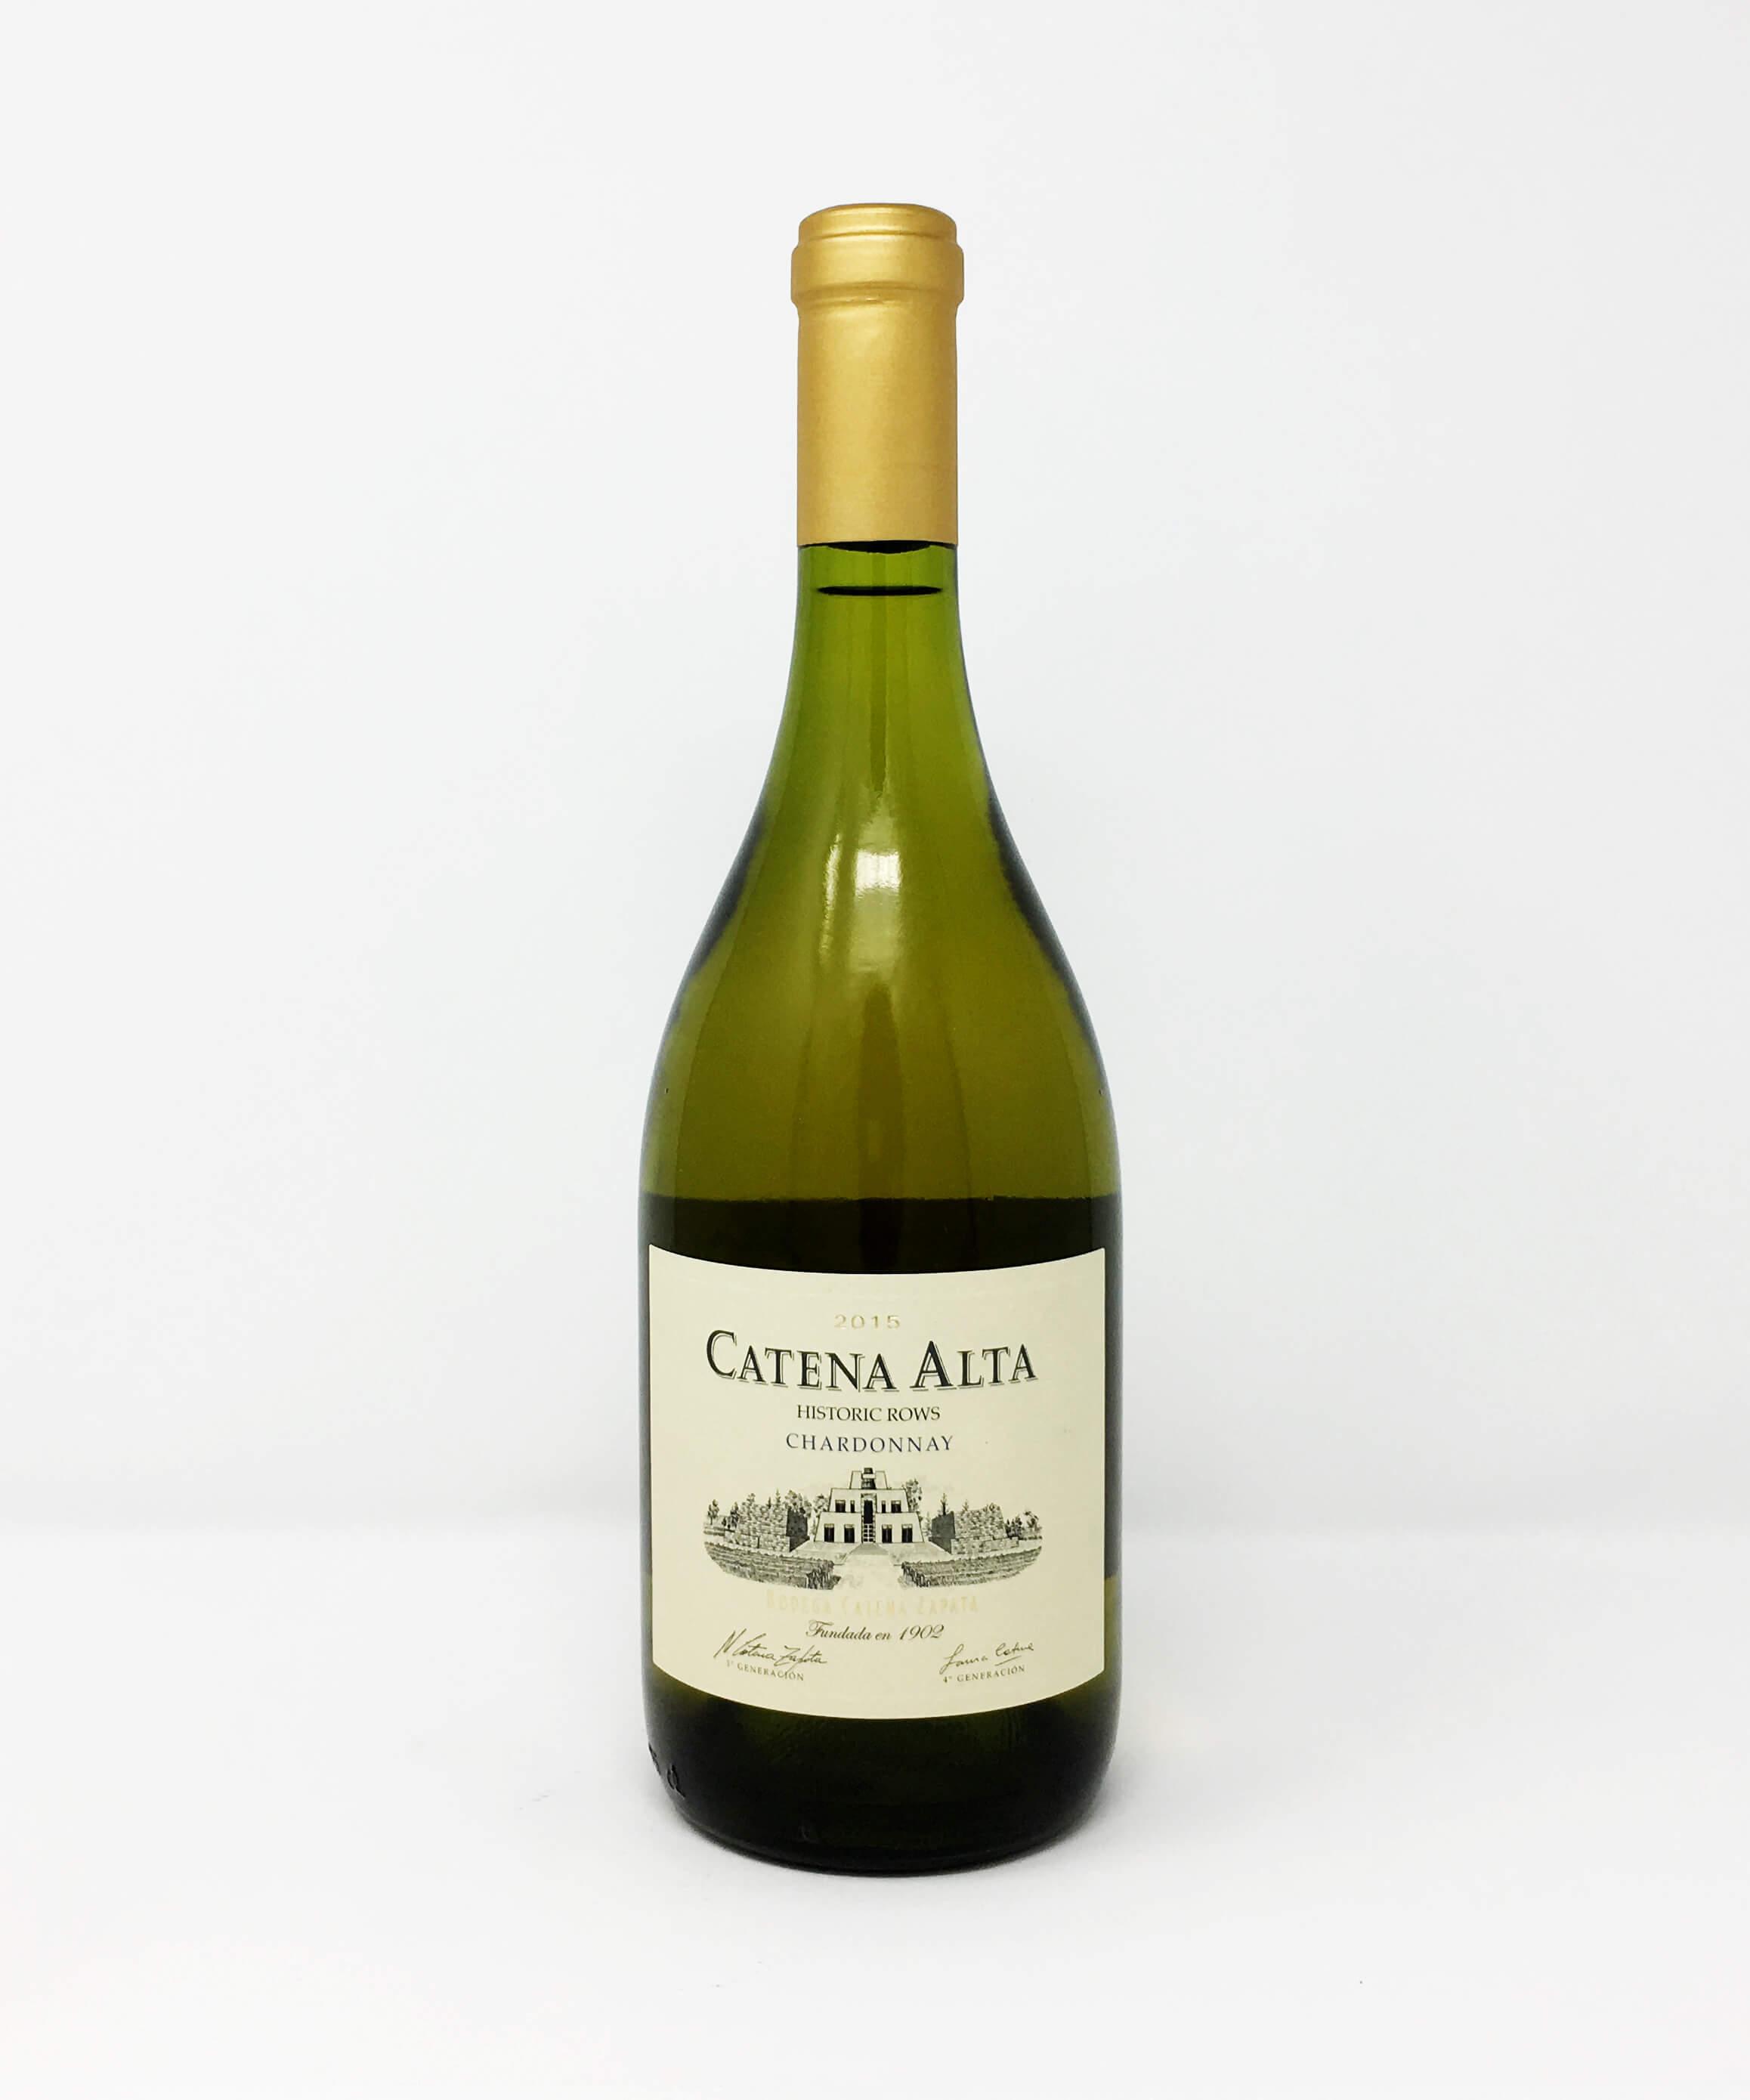 Bodegas Catena, Catena Alta, Chardonnay